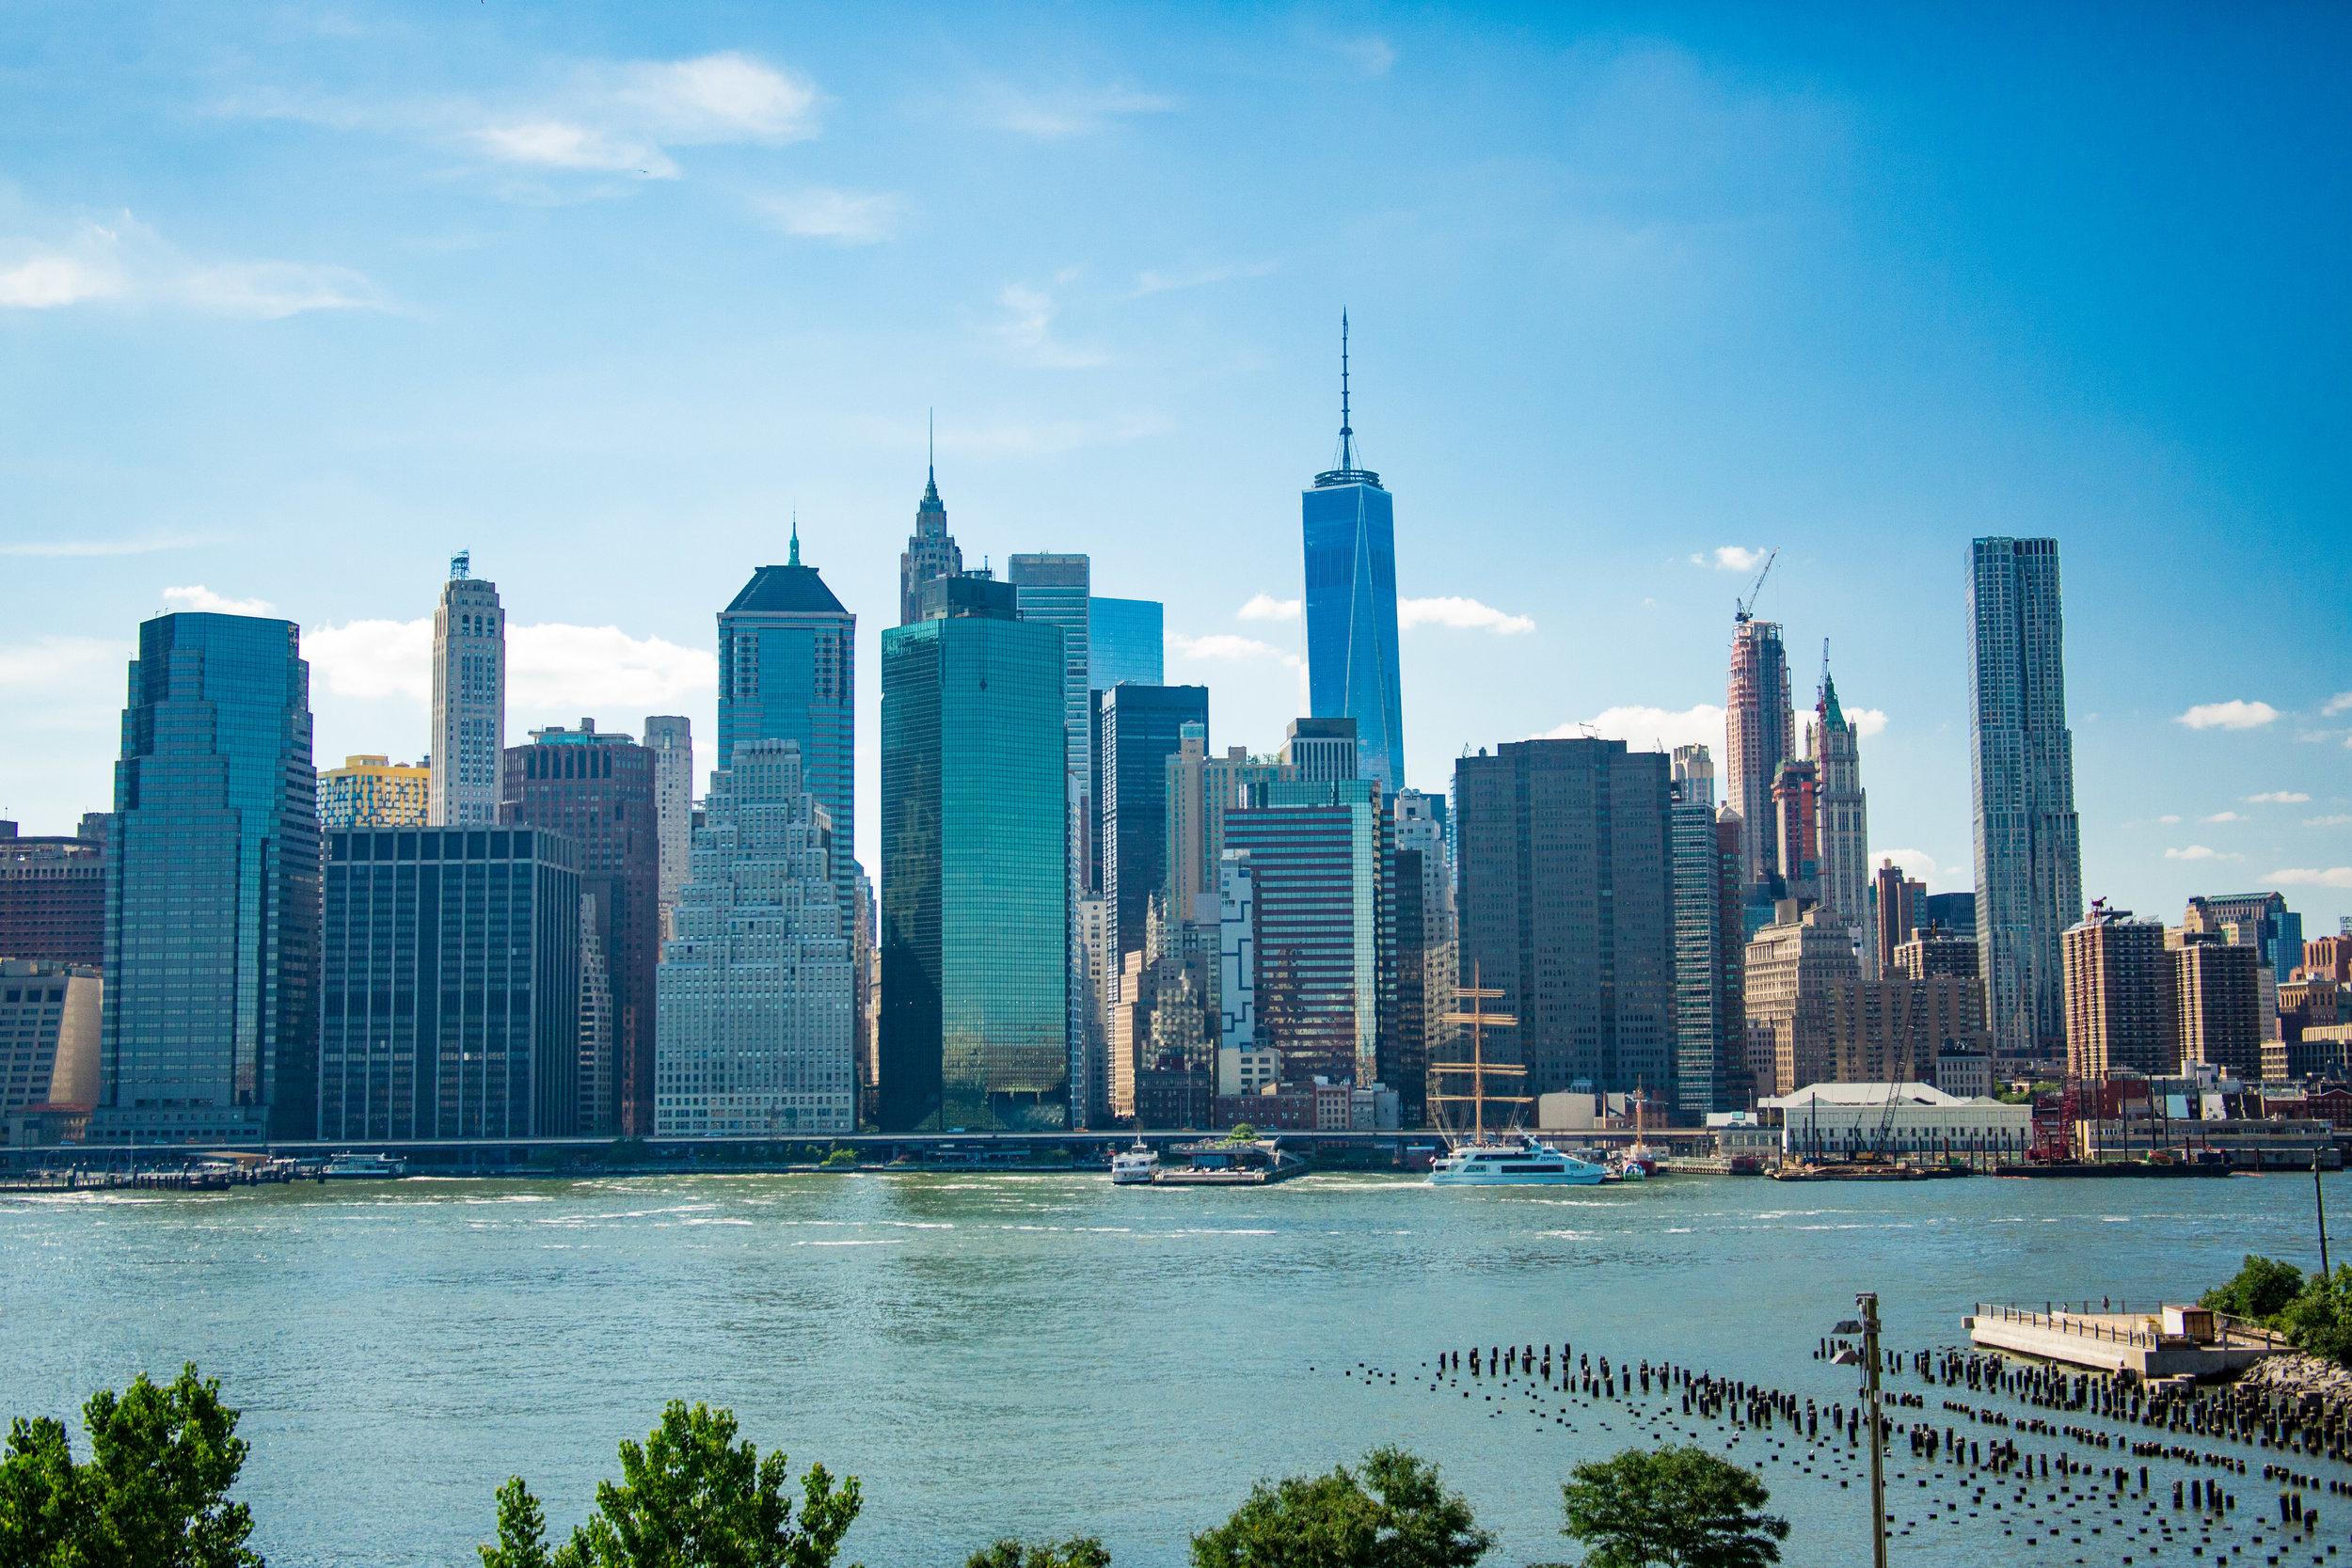 LSNY_Brooklyn_Bridge_Park-81.jpg